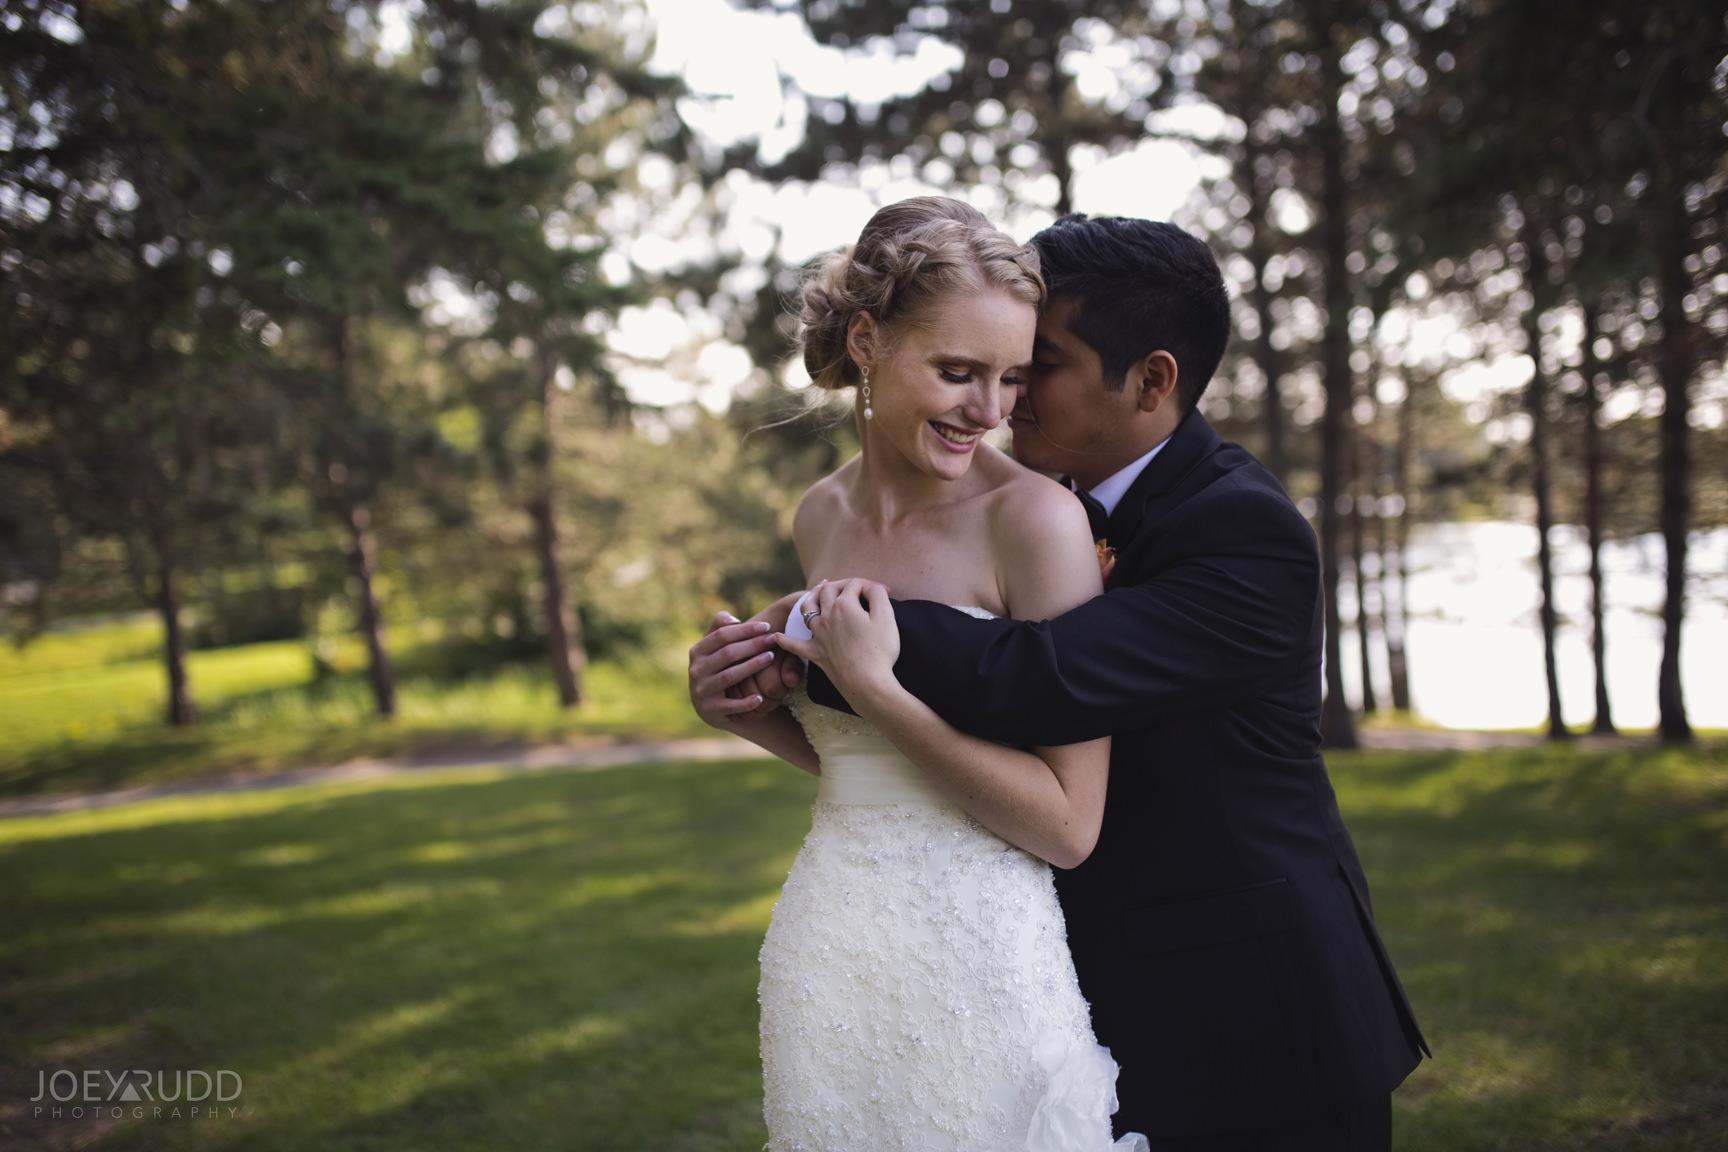 Ottawa Wedding by Ottawa Wedding Photographer Joey Rudd Photography Andrew Hayden Park Wedding Ron Kolbus Lakeside Centre Candid